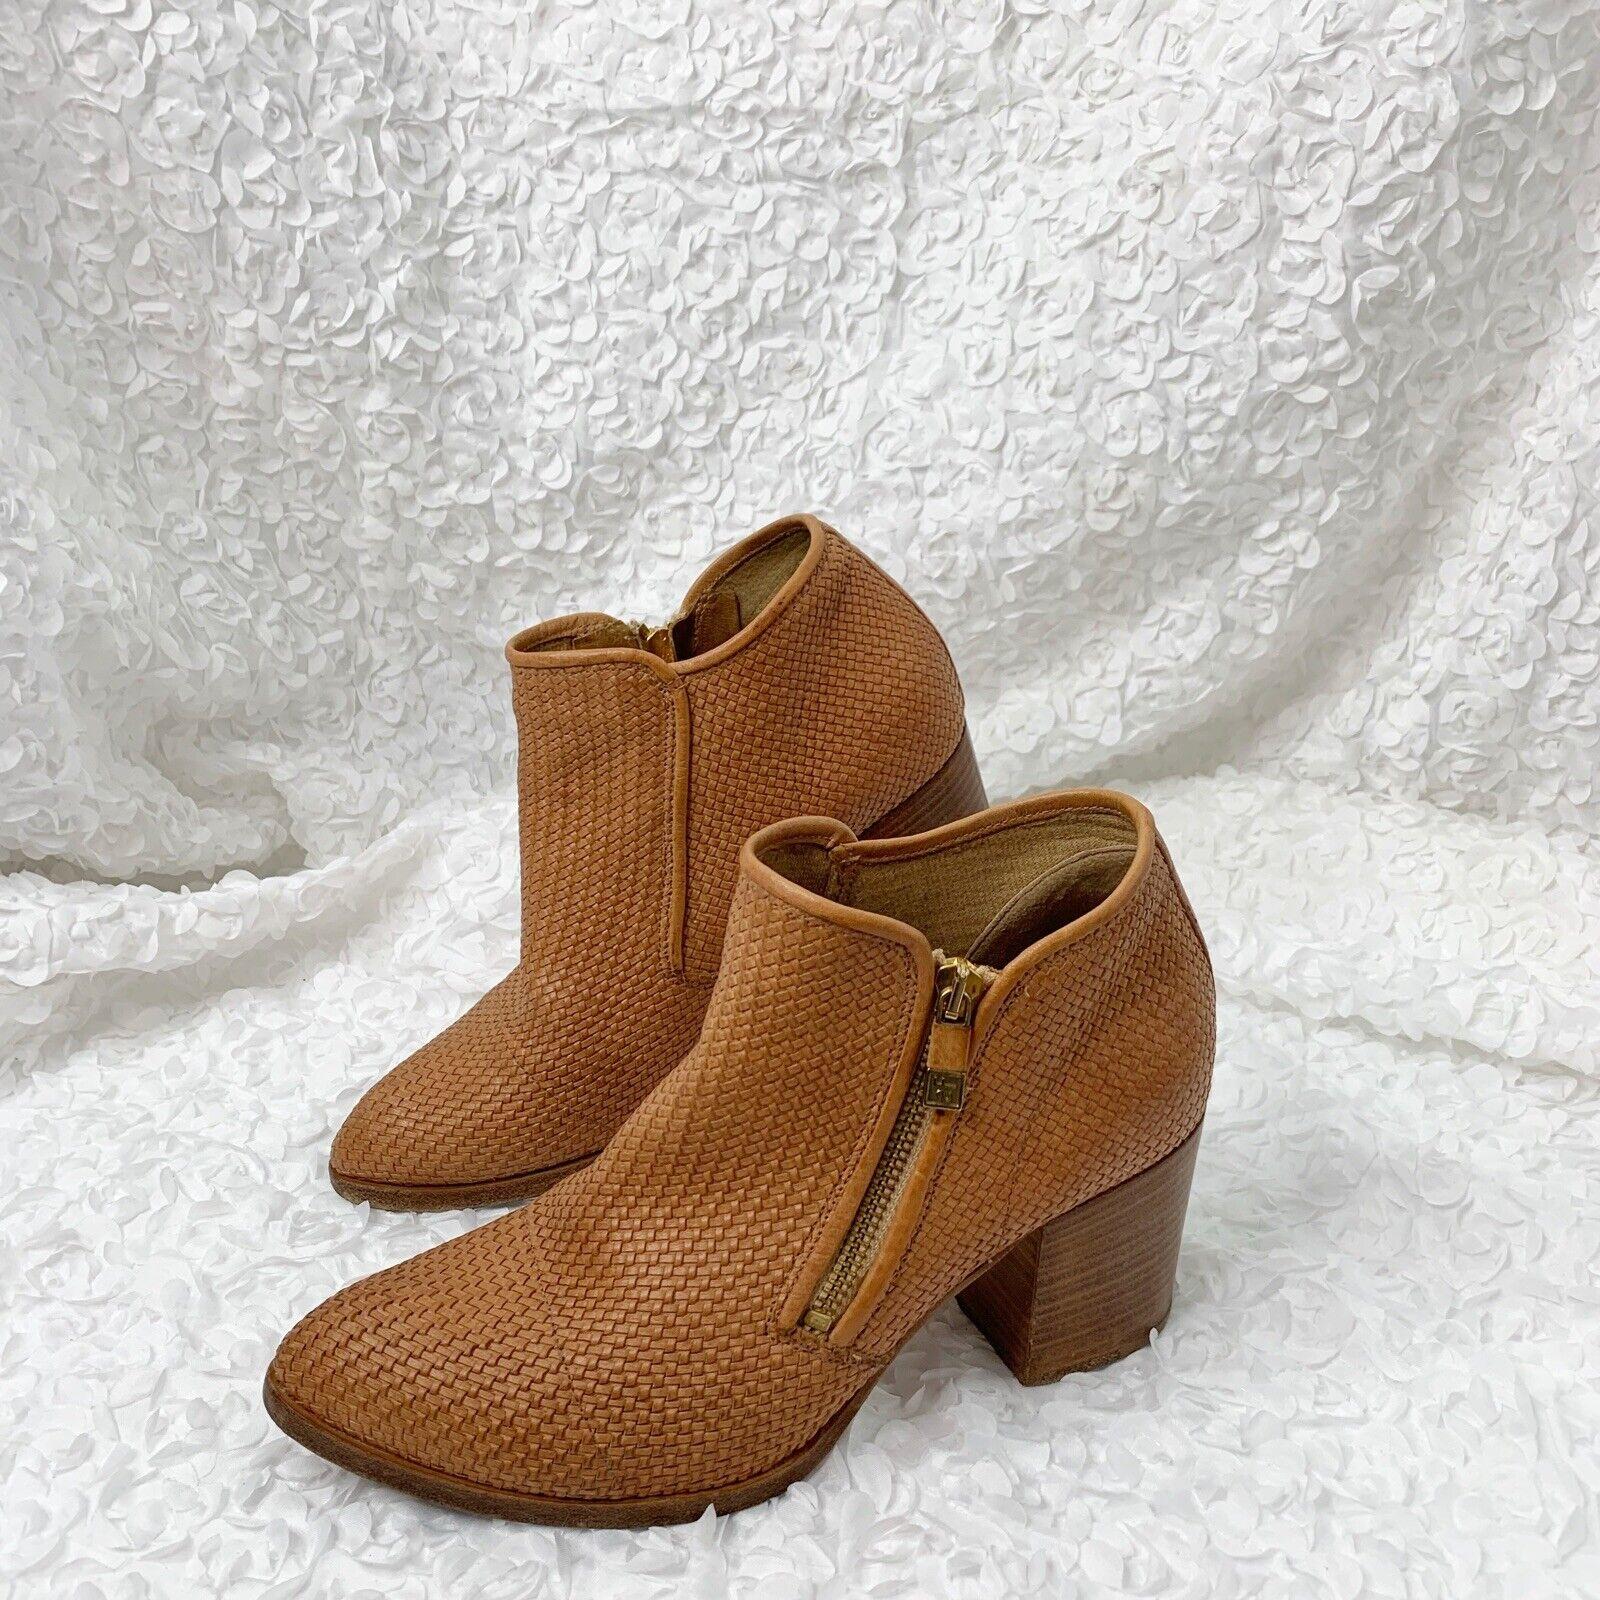 Alberto Fermani Cognac Tan Leather Woven Booties 9